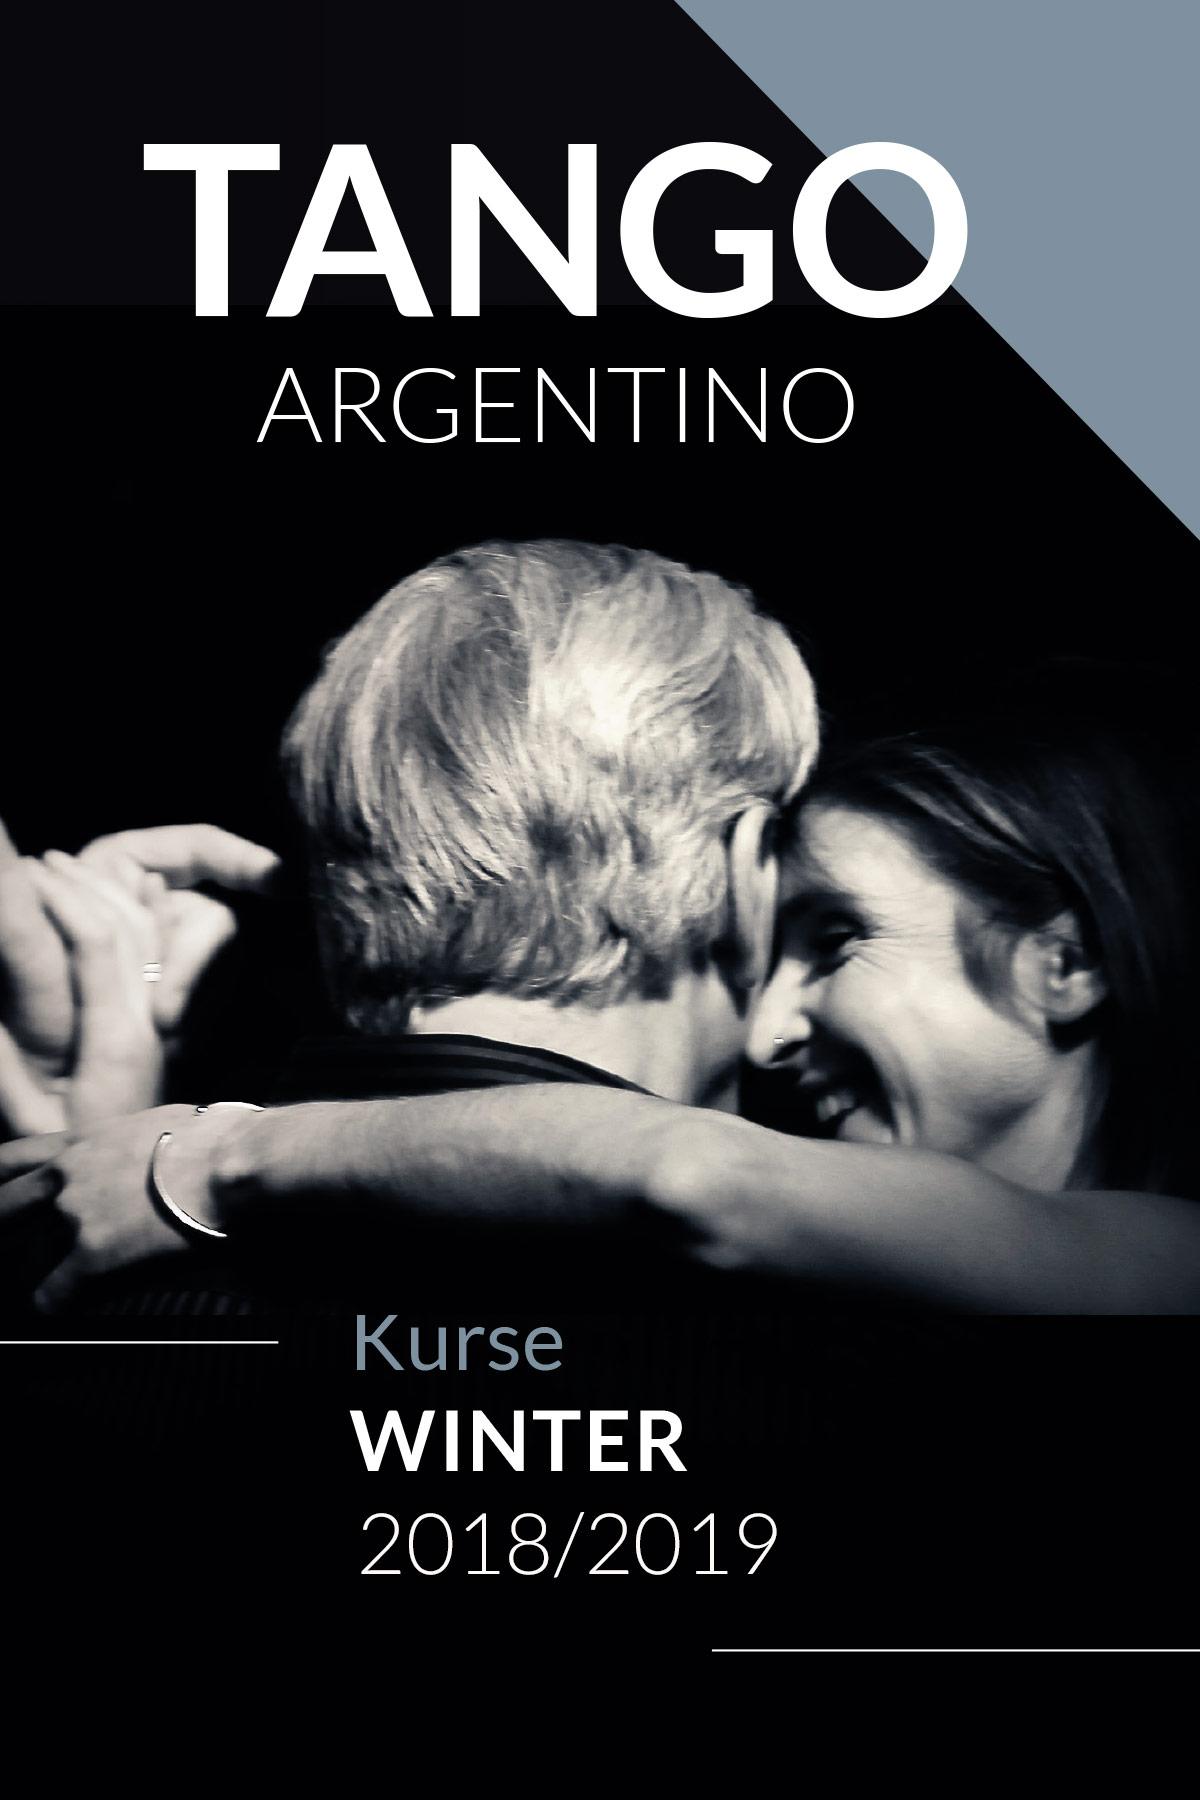 Tango Kursprogramm Winter 2018 2019